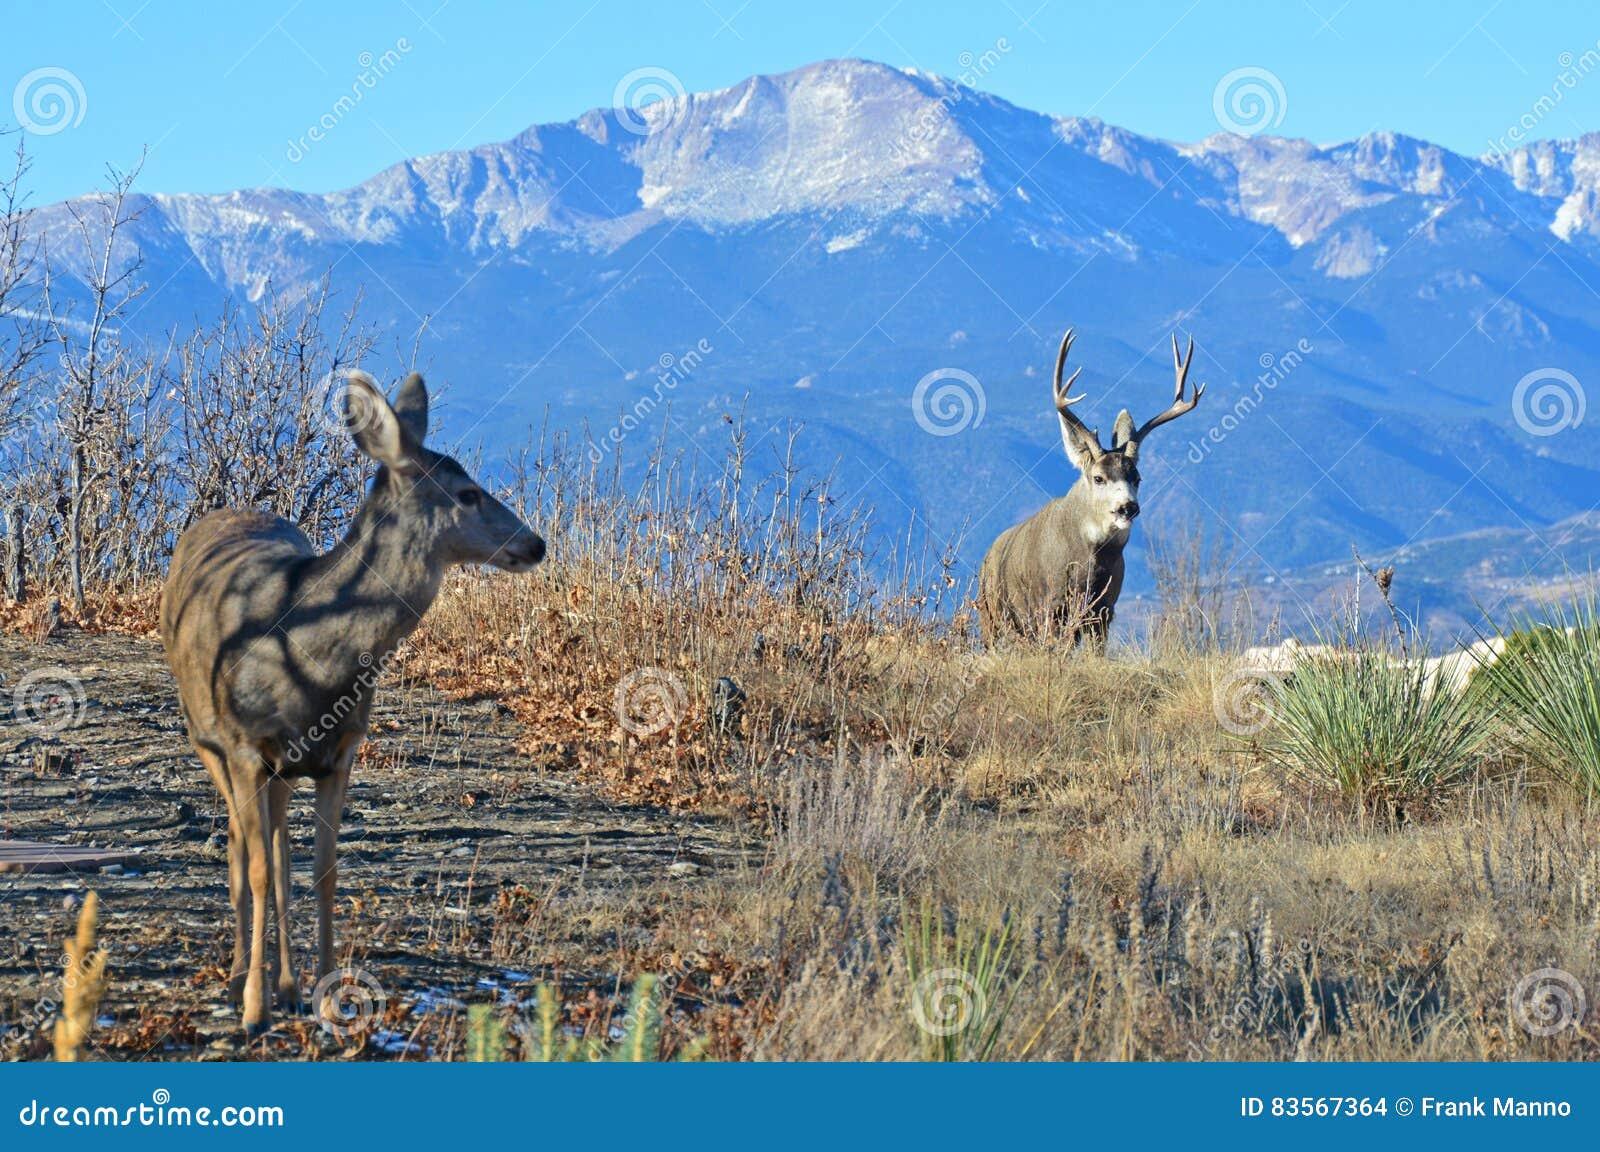 A Buck and Doe Deer Exchange Glance at Mating Season